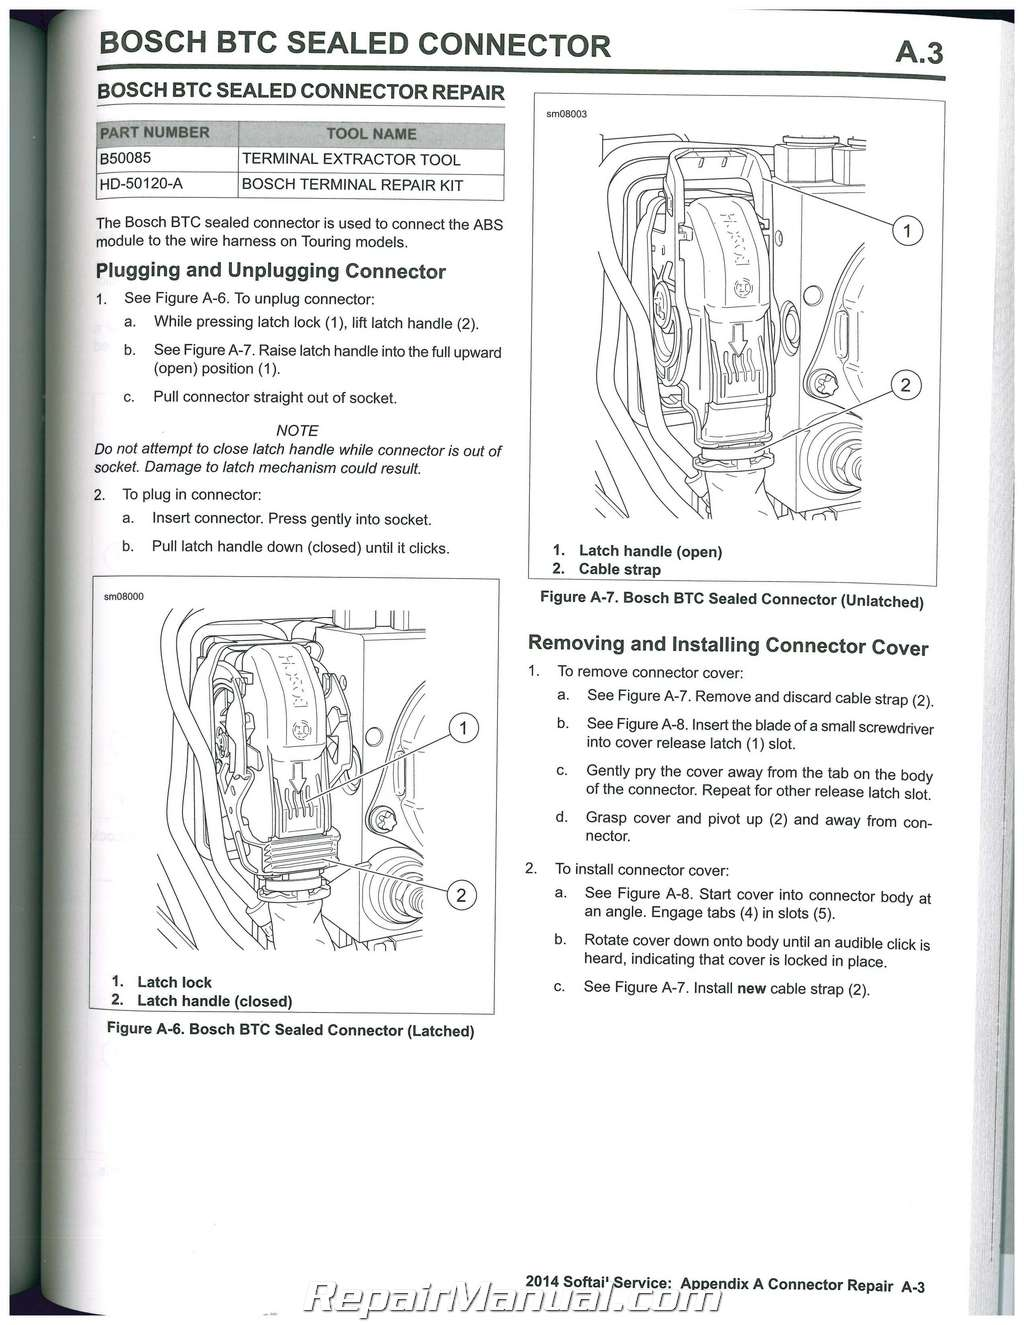 Harley davidson flstc wiring diagram